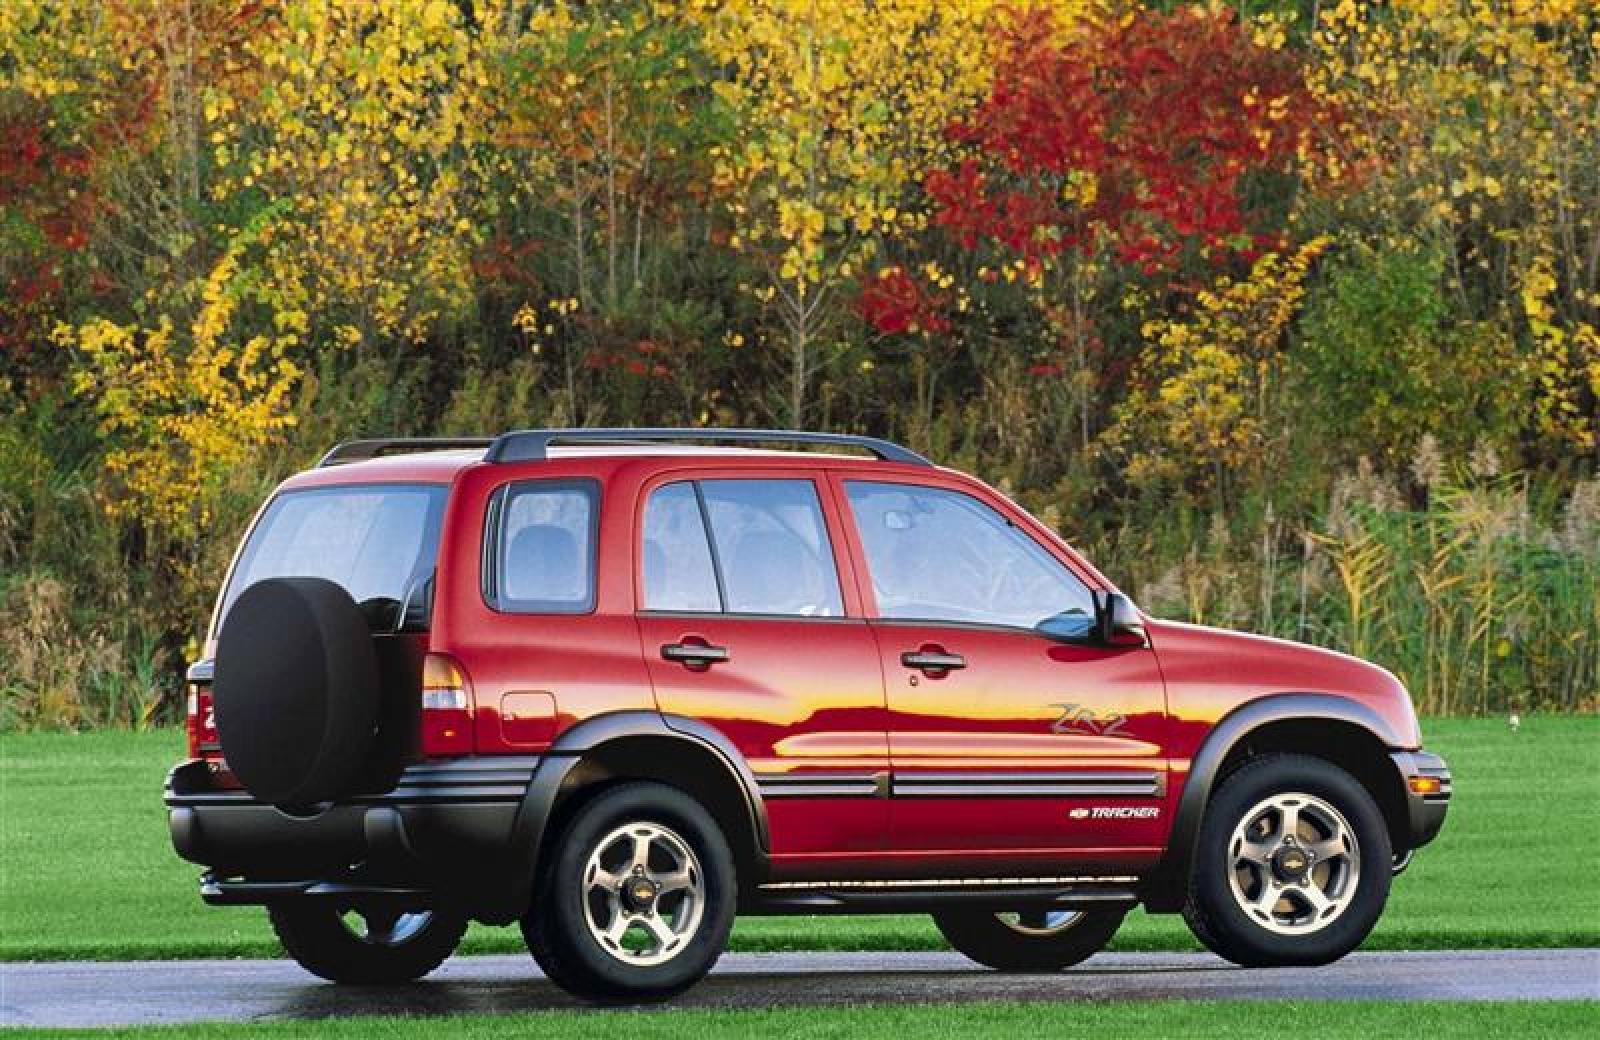 2000 Chevrolet Tracker #11 Chevrolet Tracker #11 800 1024 1280 1600 origin  ...